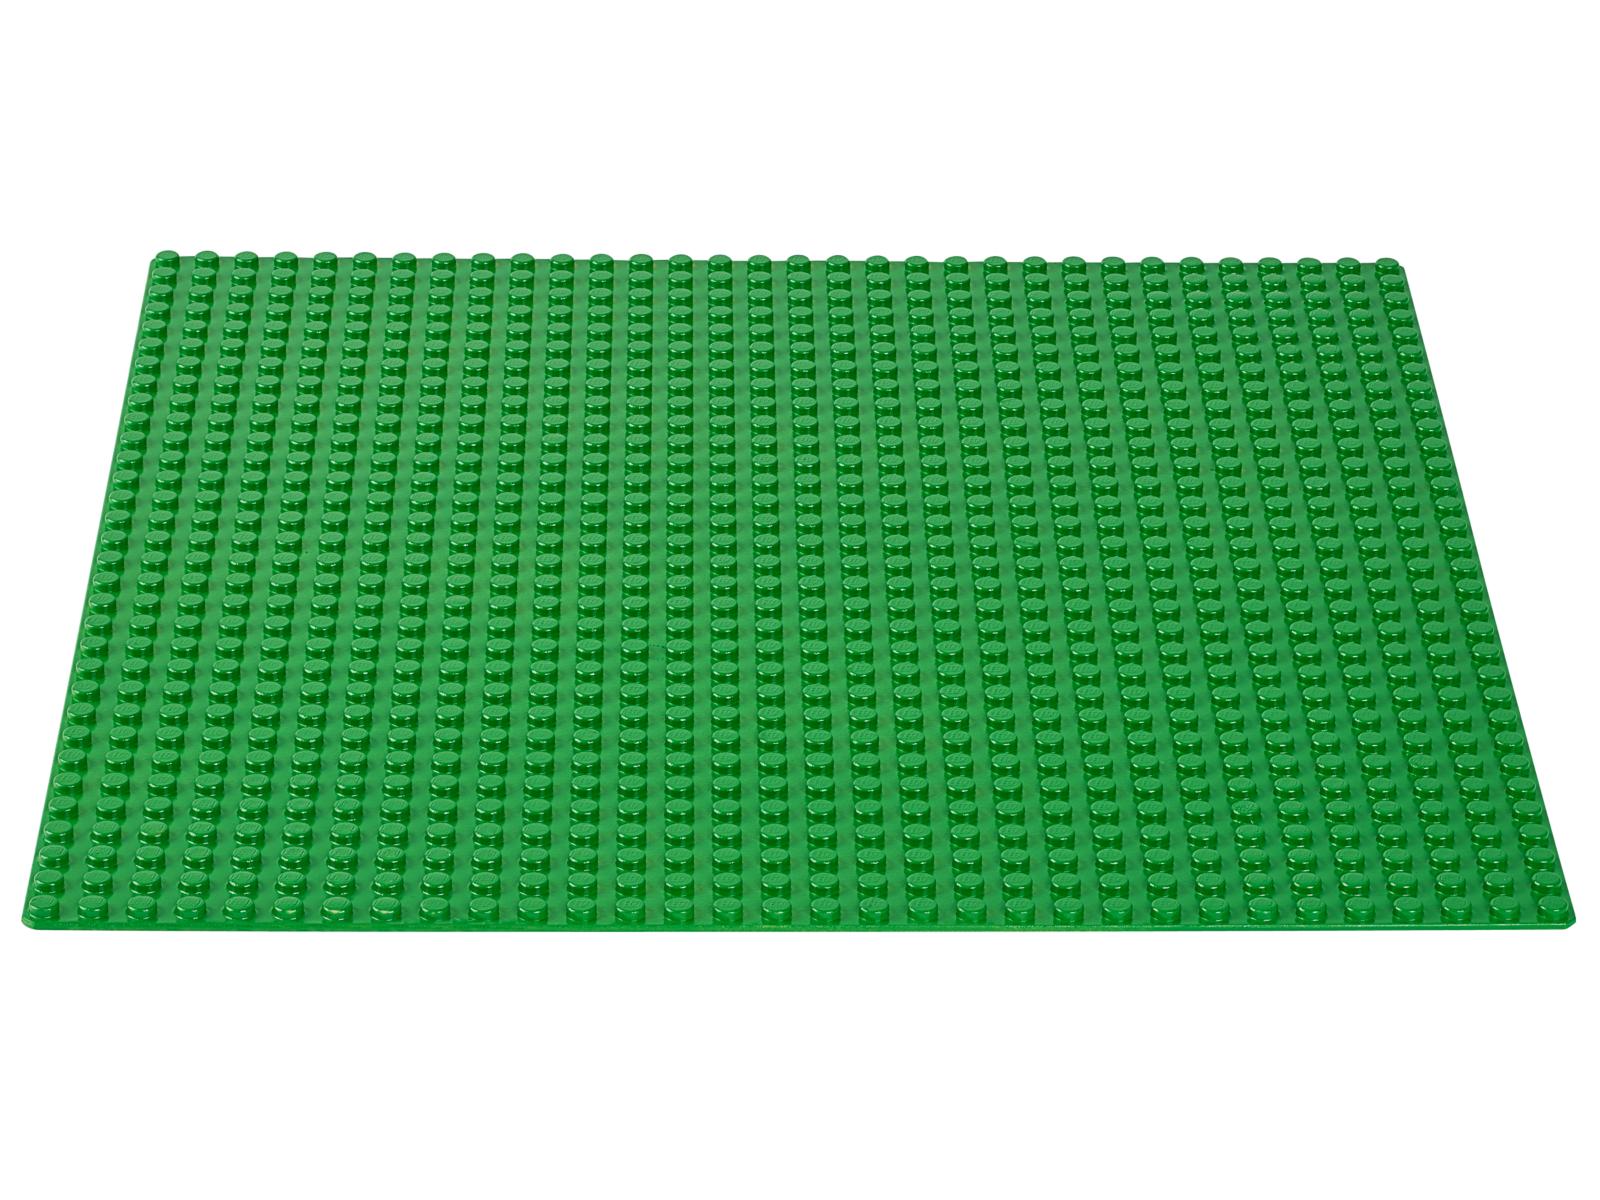 LEGO Classic Green Base Plate 10700